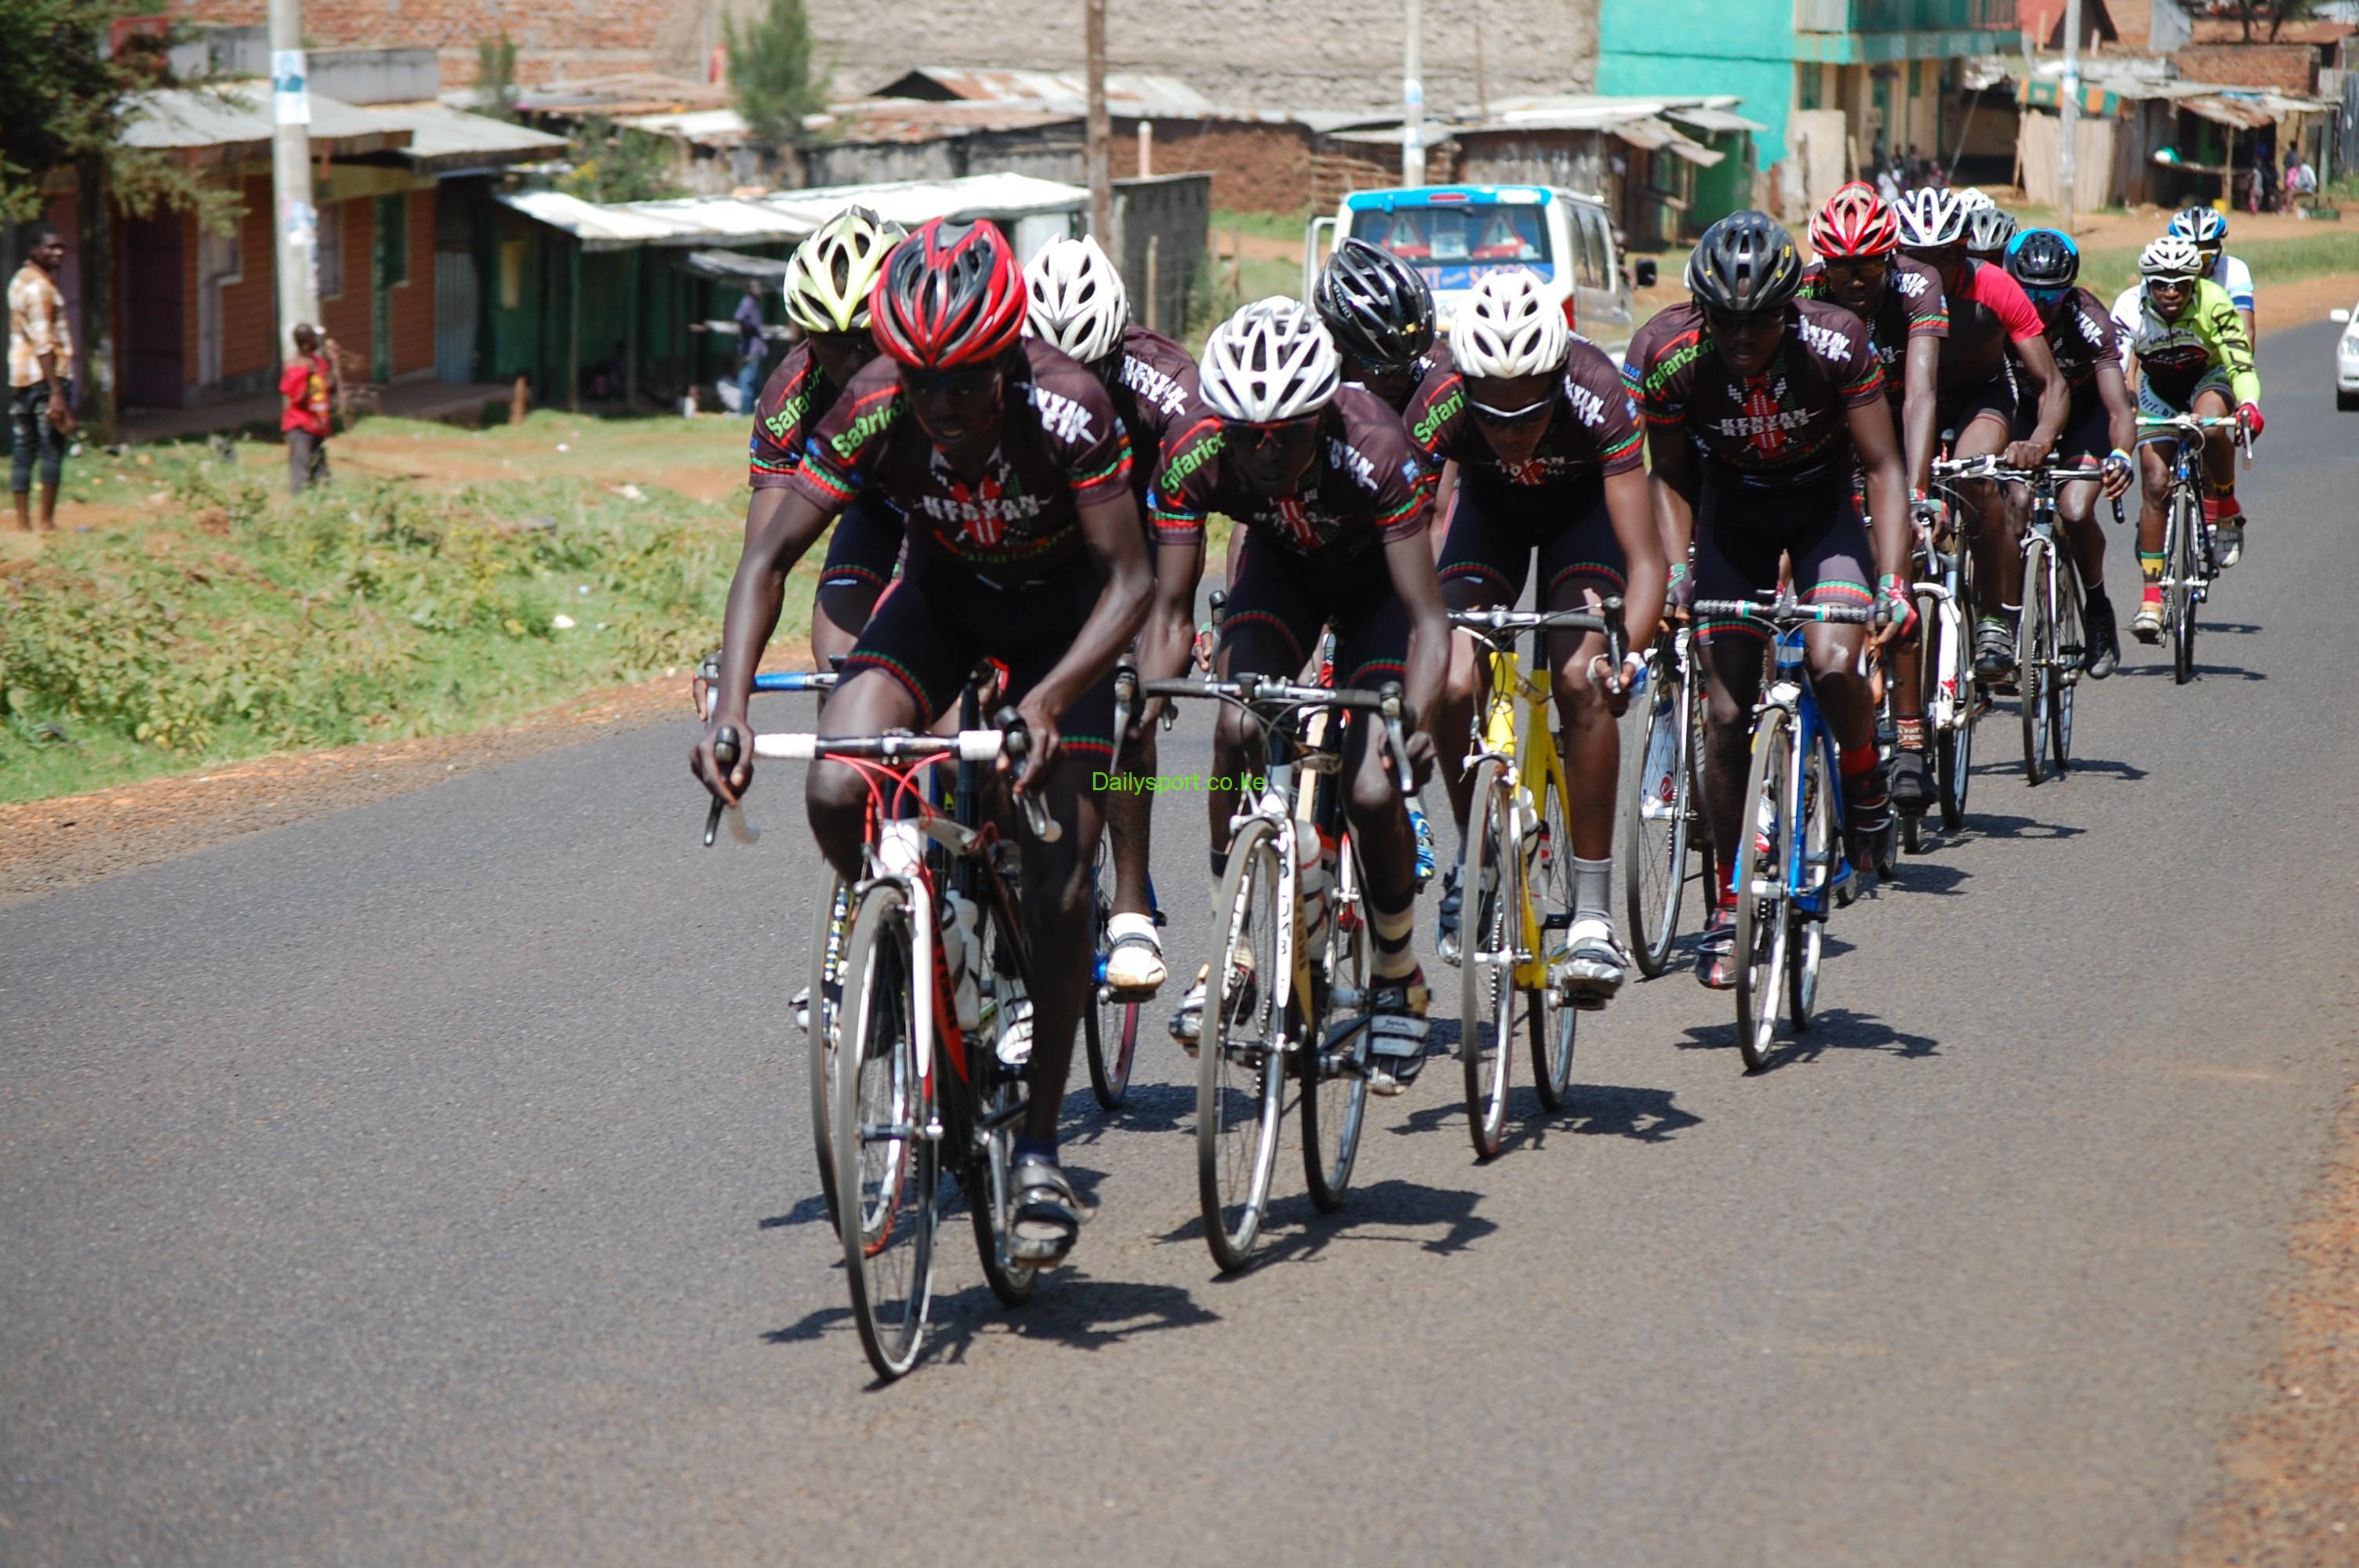 Kenya Pipeline cycling, Kenya Pipeline Company, Geoffrey Langat